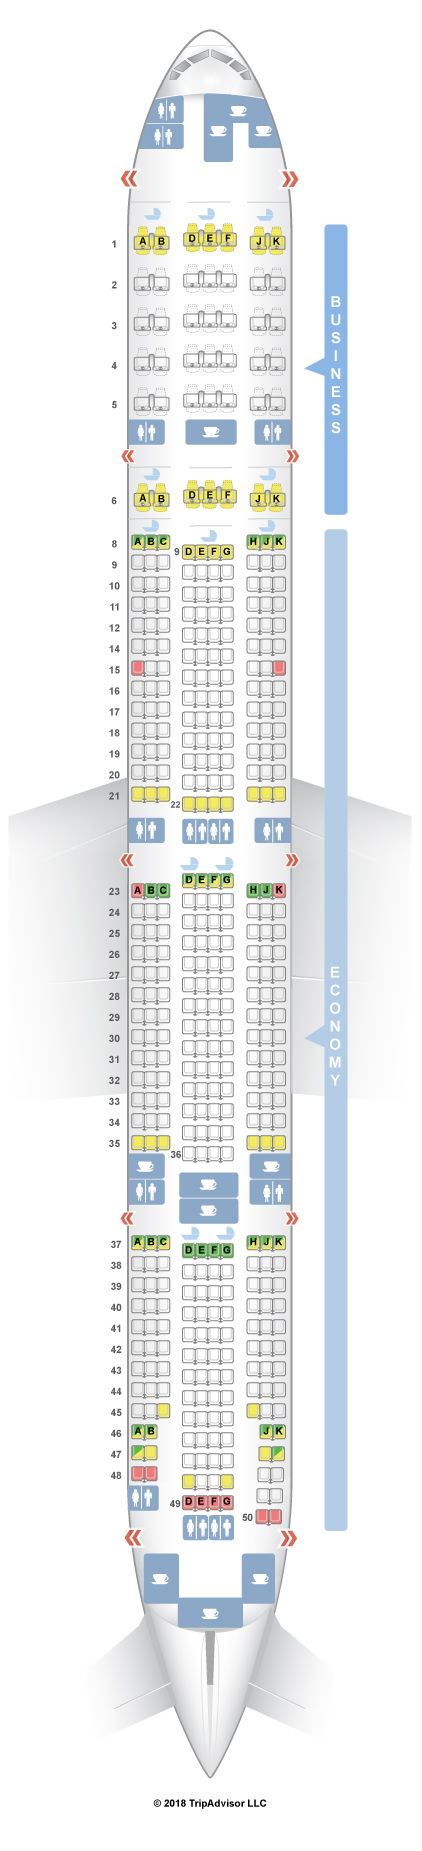 SeatGuru Seat Map Emirates Boeing 777 300ER (77W) Two Class